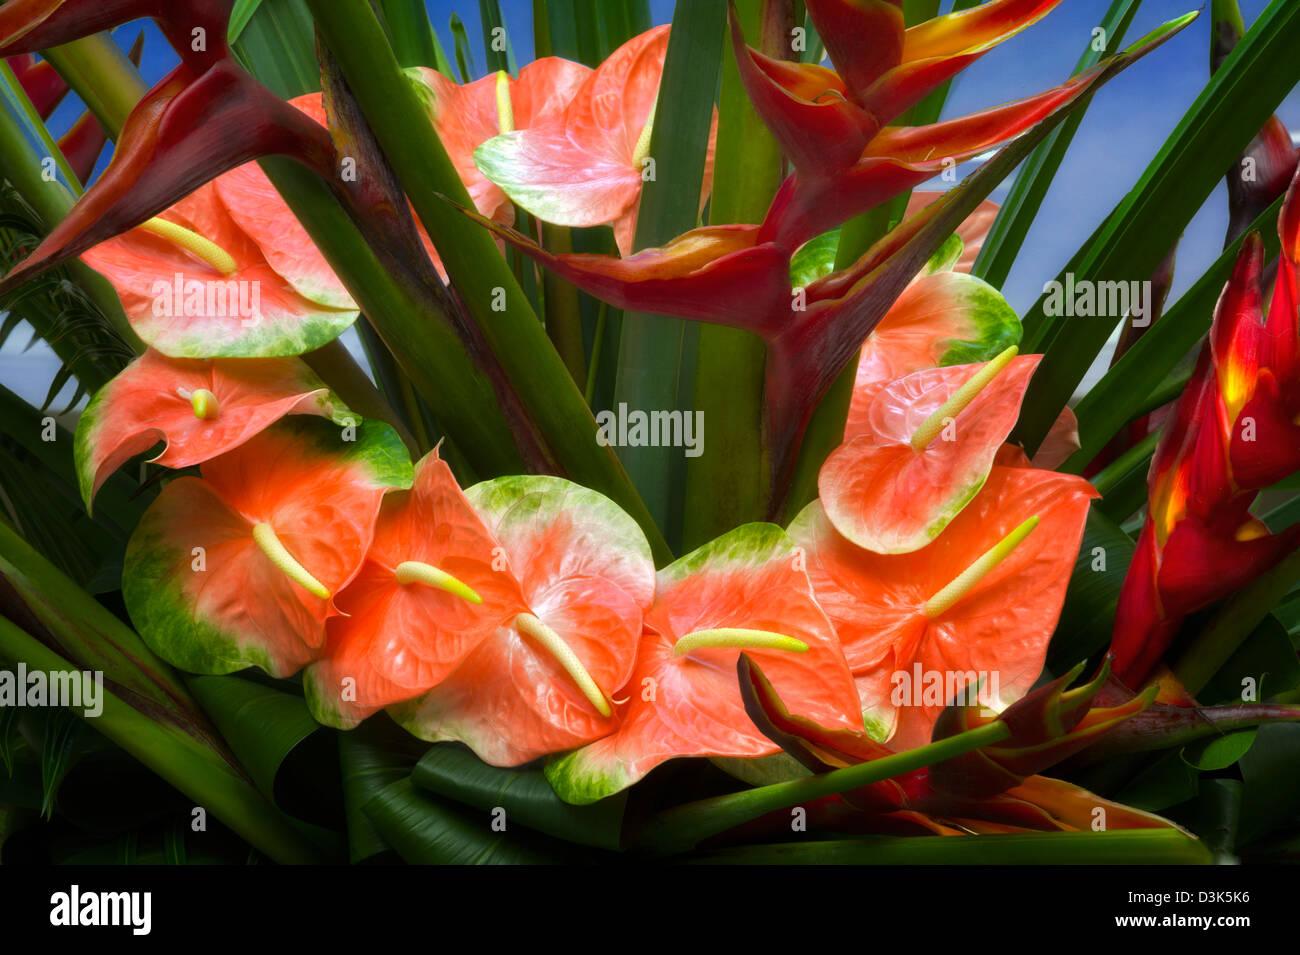 Fiore tropicale display con Anthurium. Immagini Stock